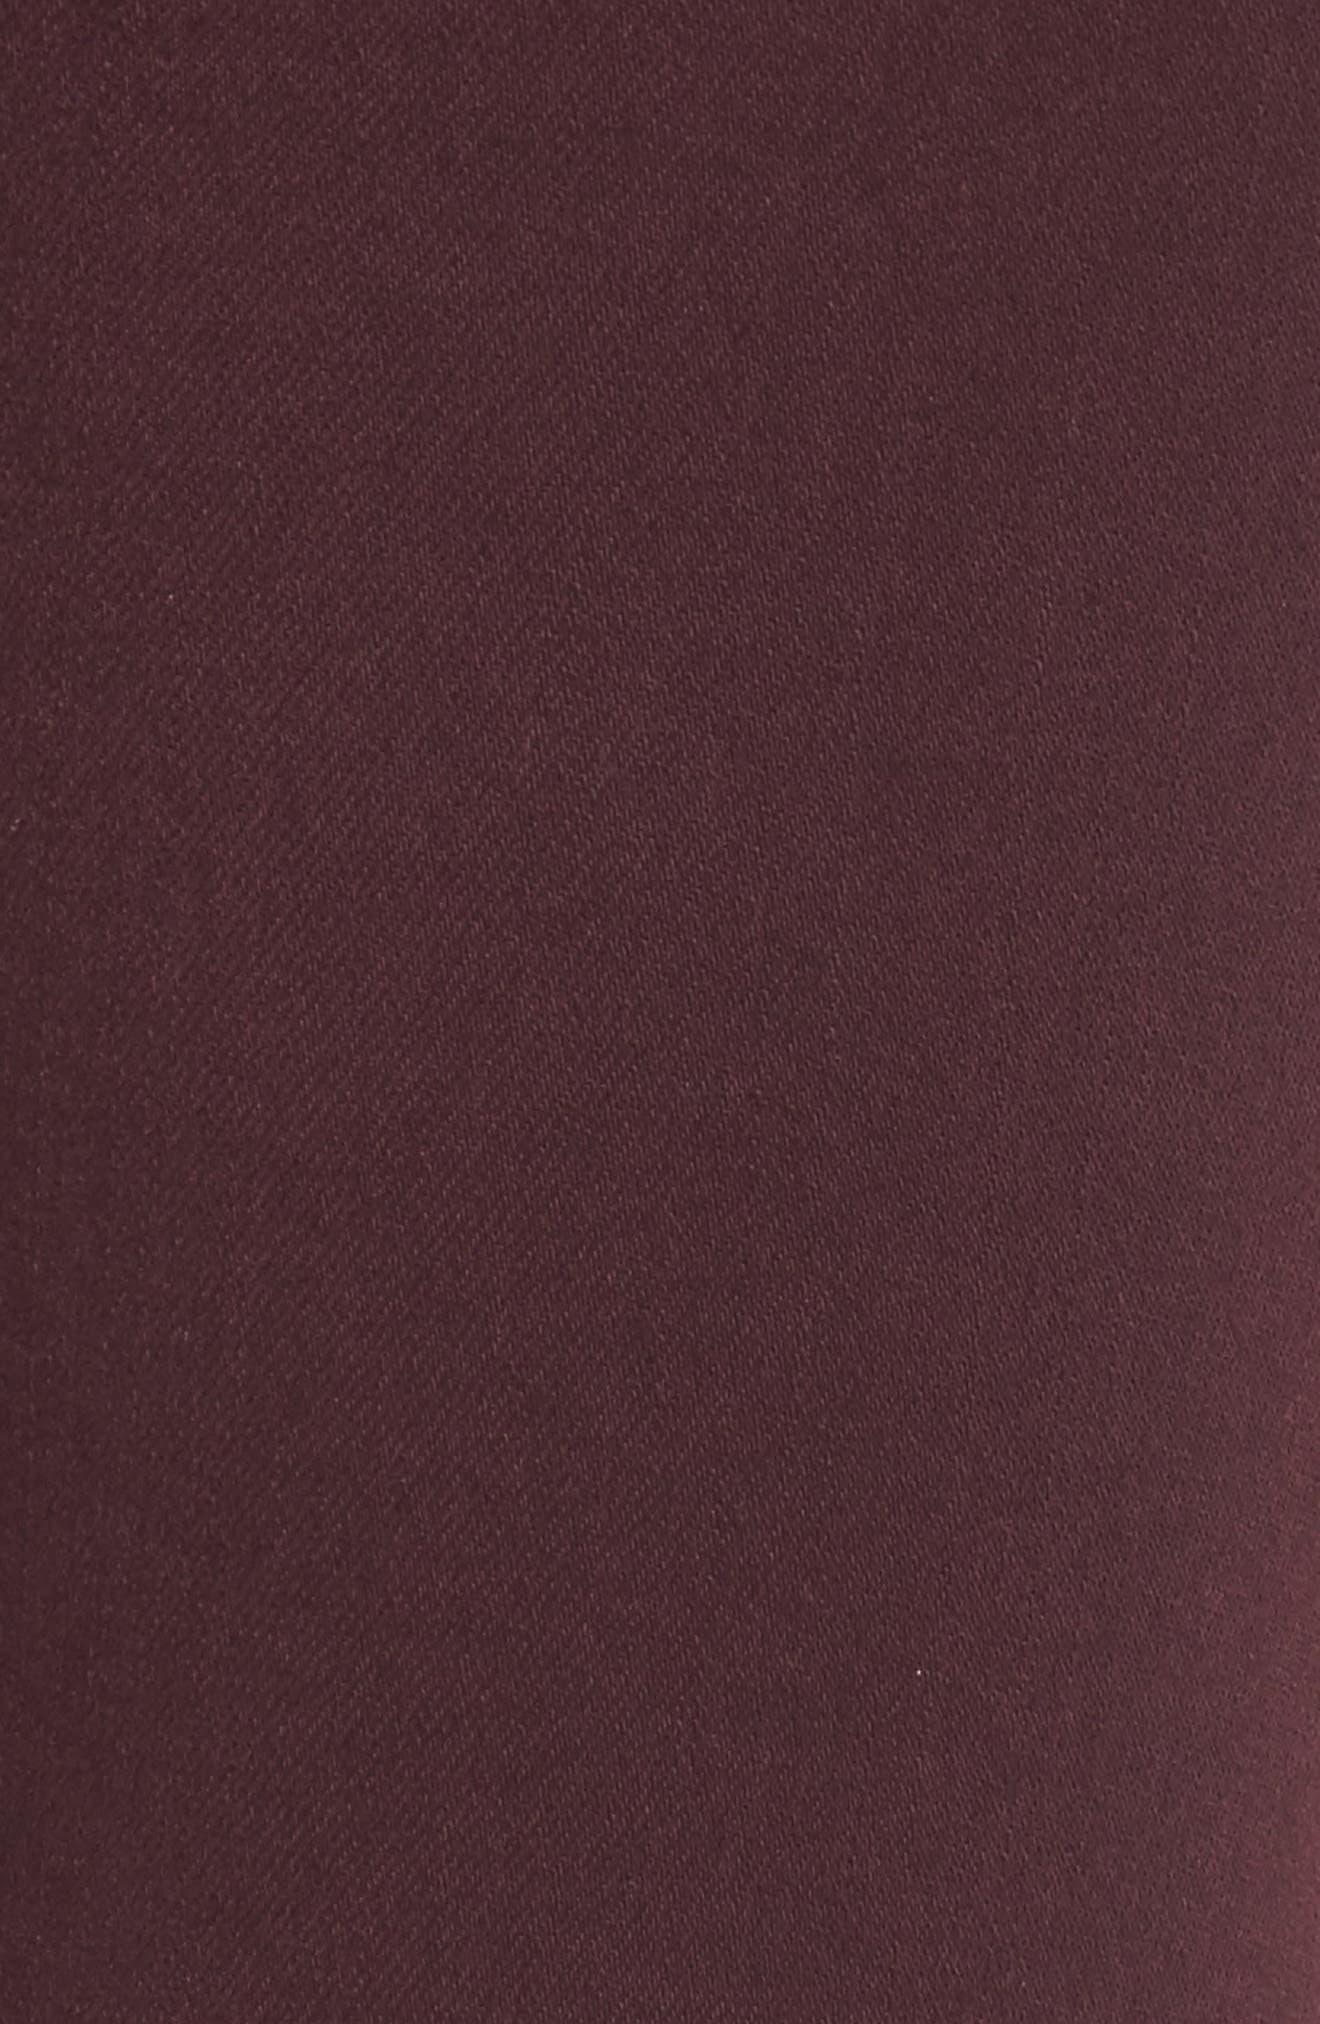 Alternate Image 5  - Good American Good Legs High Waist Skinny Jeans (Burgundy 001) (Regular & Plus Size)